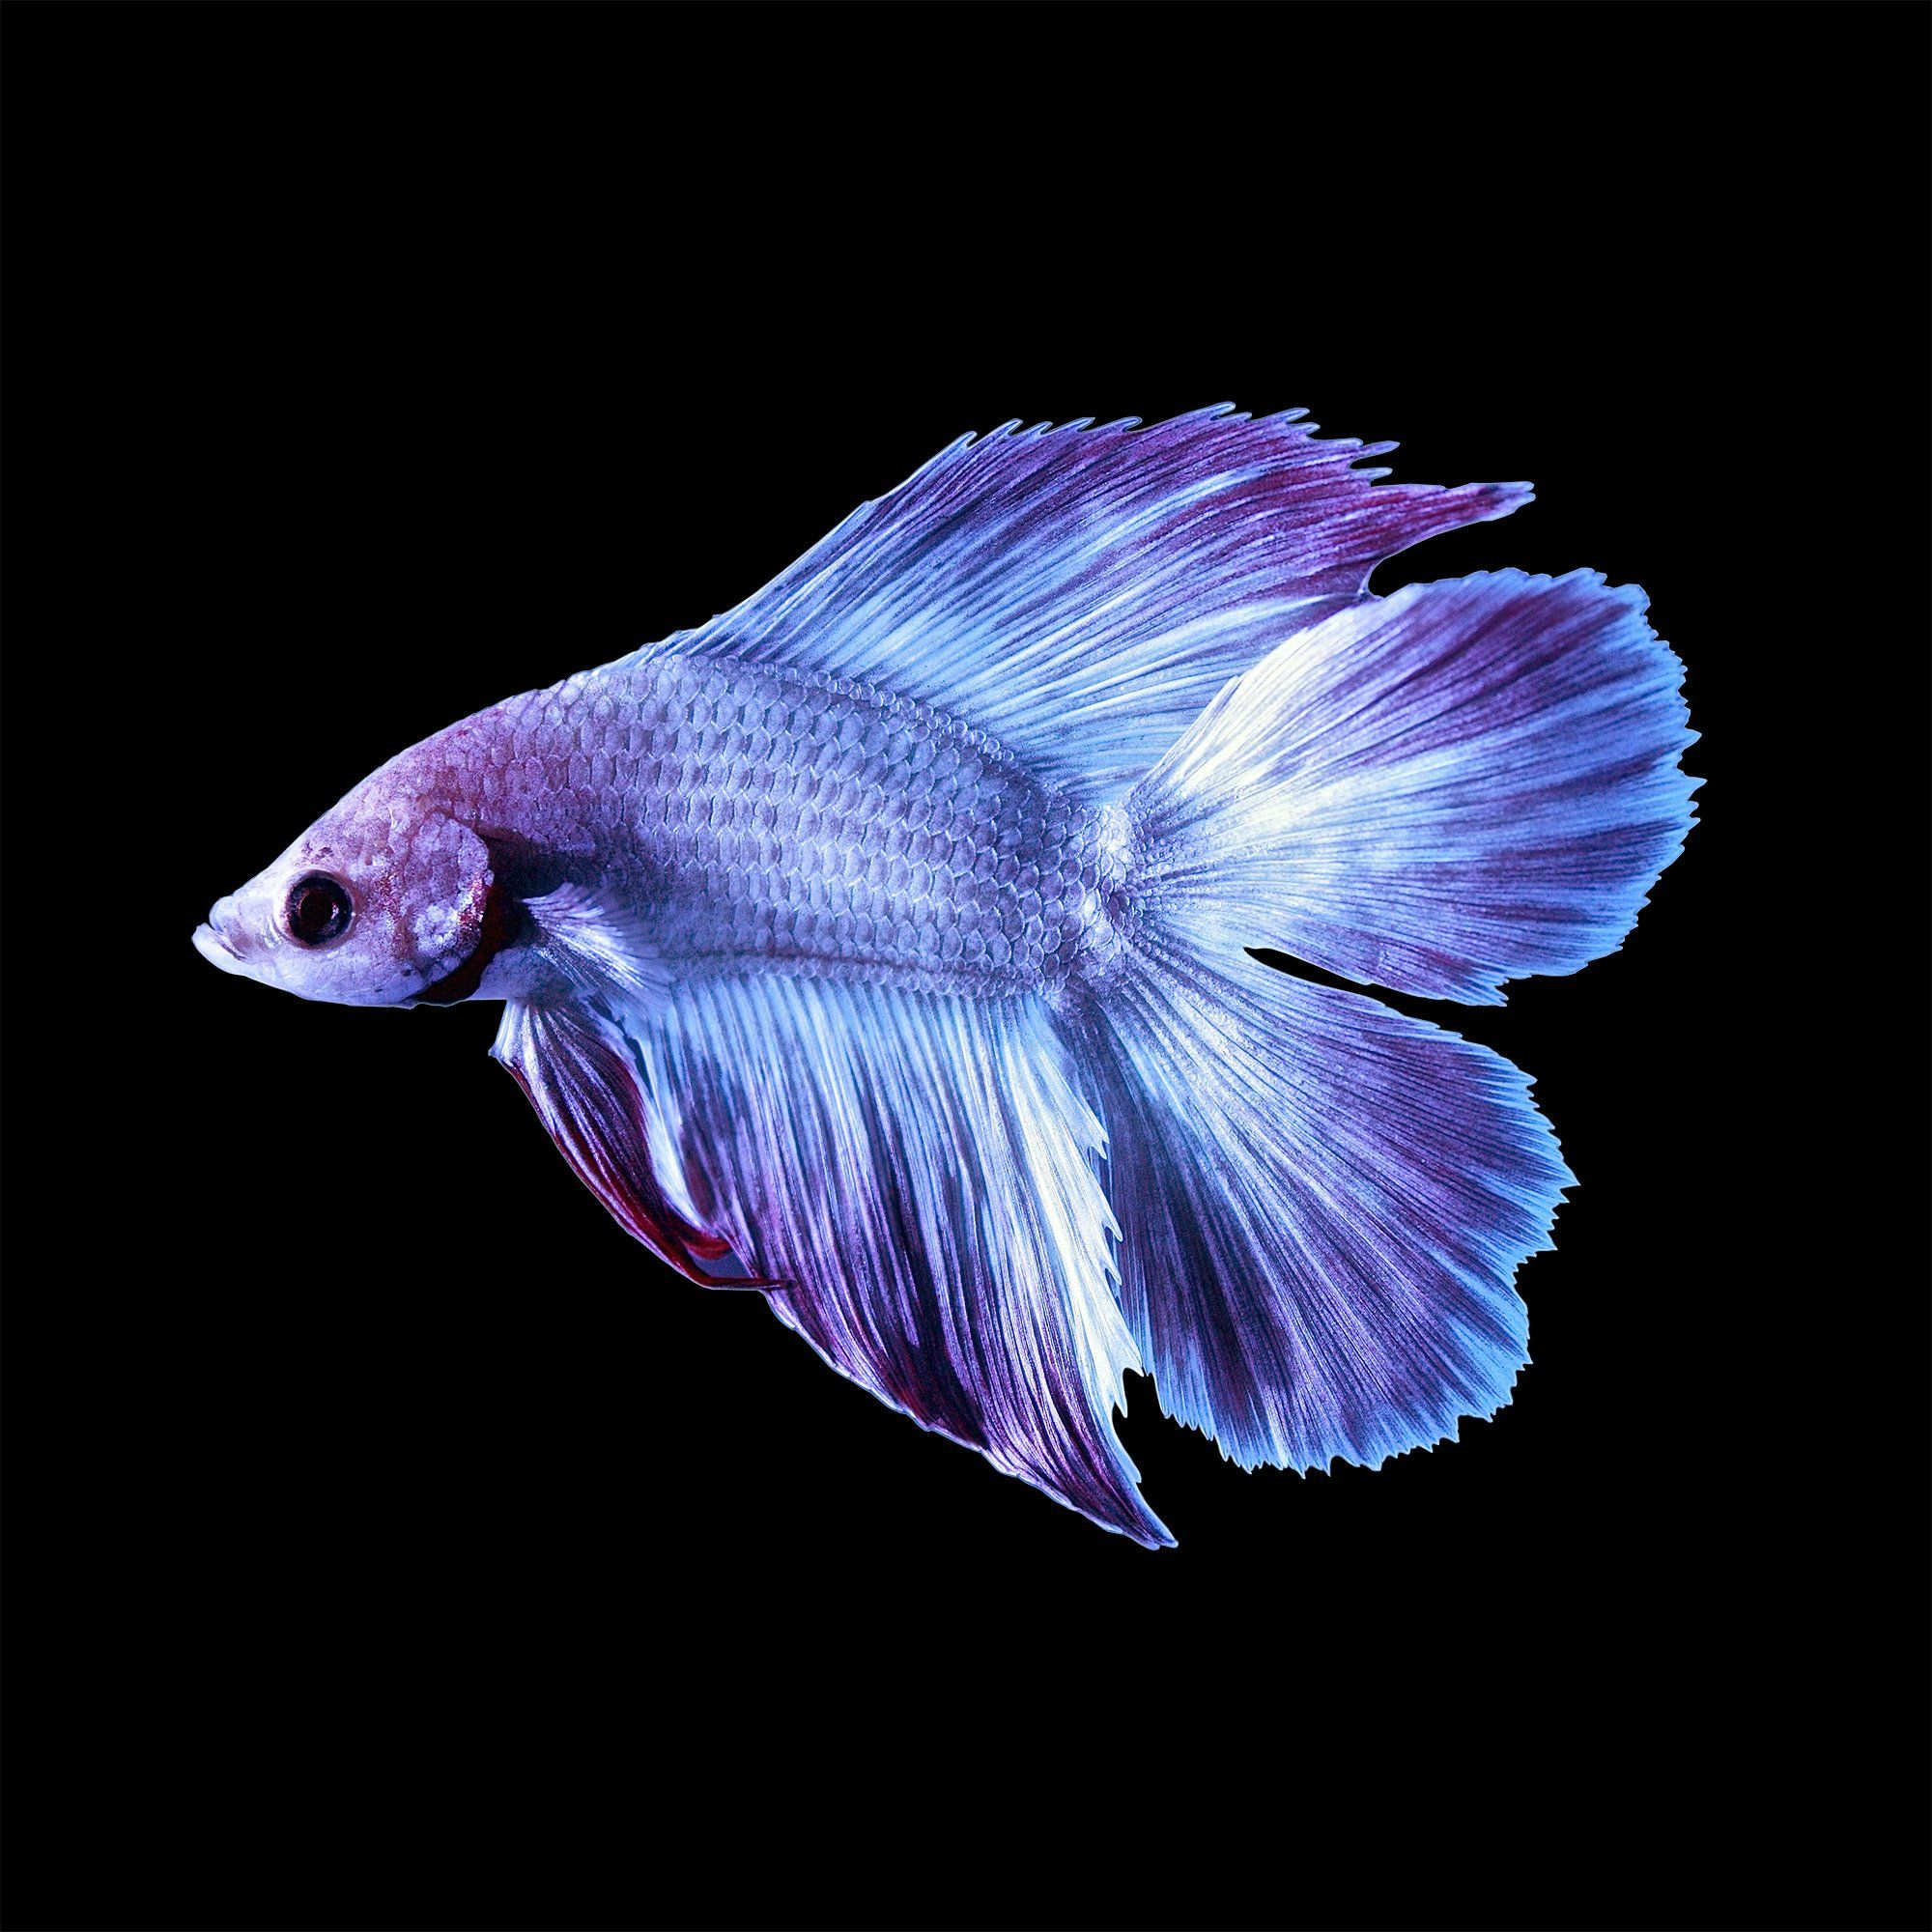 Male Doubletail Bettas For Sale Order Online Petco In 2020 Pet Fish Betta Fish Betta Fish Tank